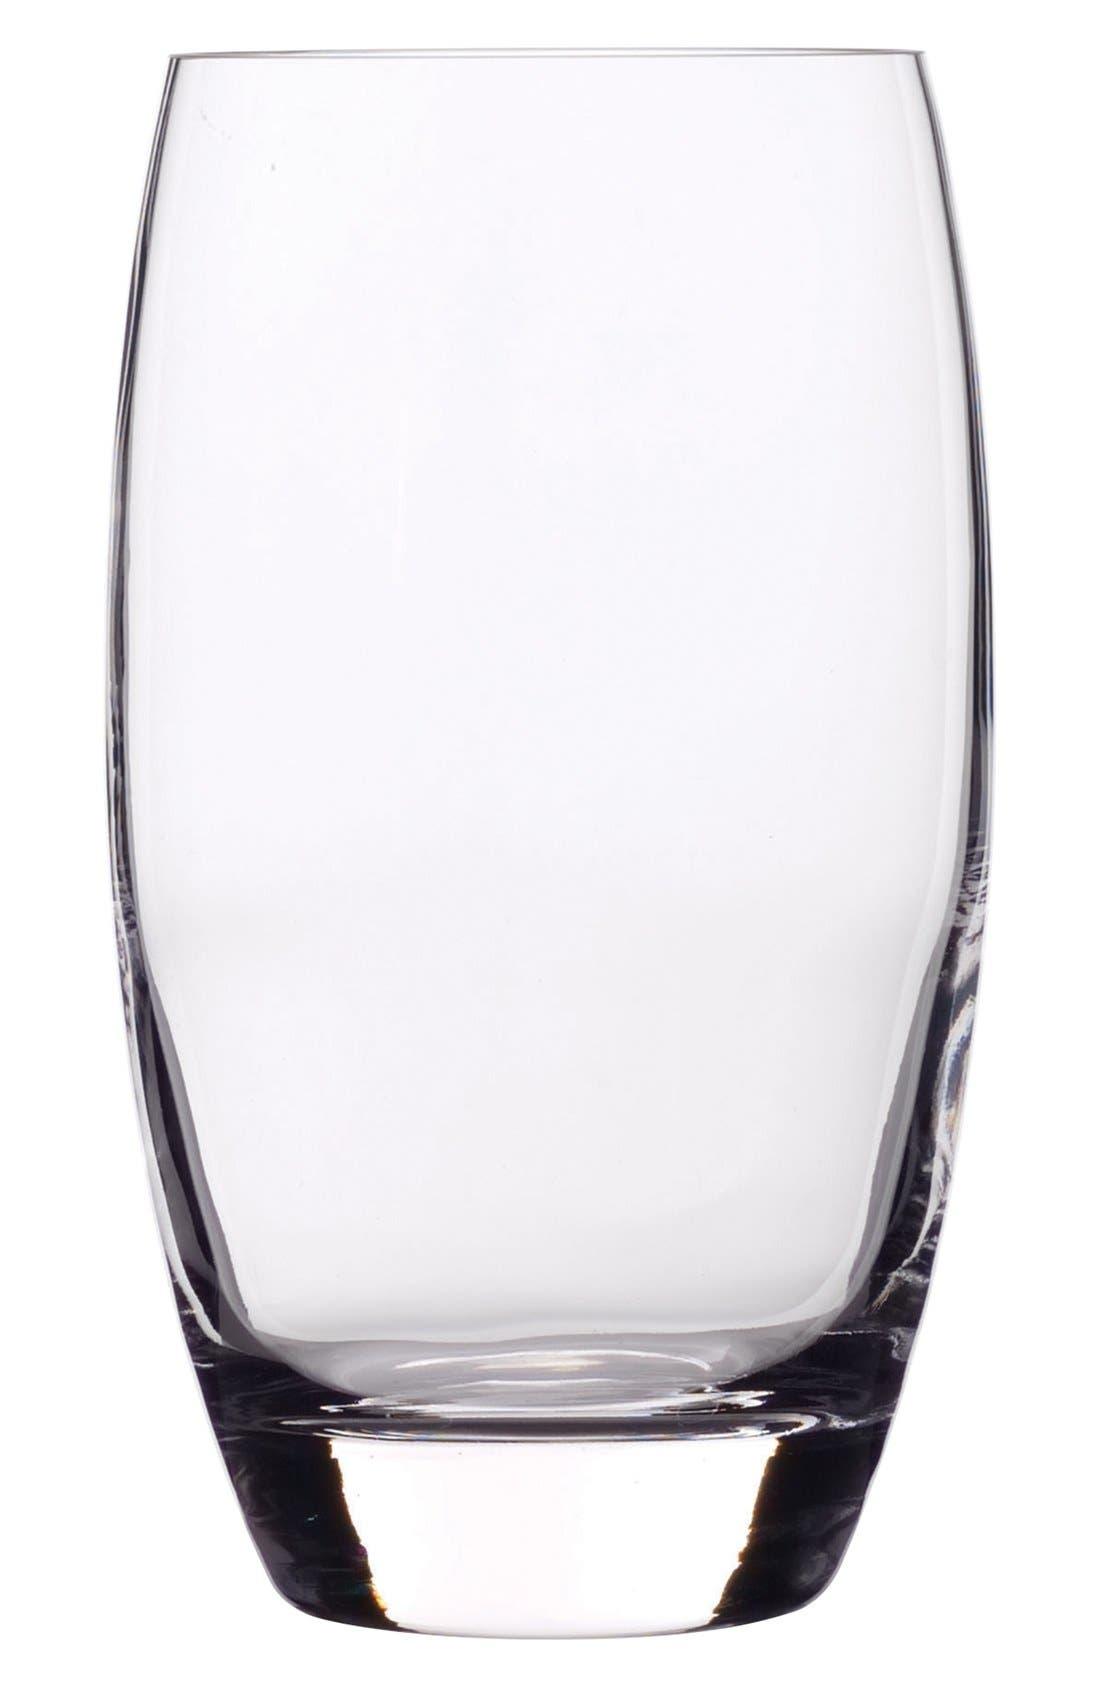 'Crescendo' Beverage Glasses,                             Main thumbnail 1, color,                             CLEAR